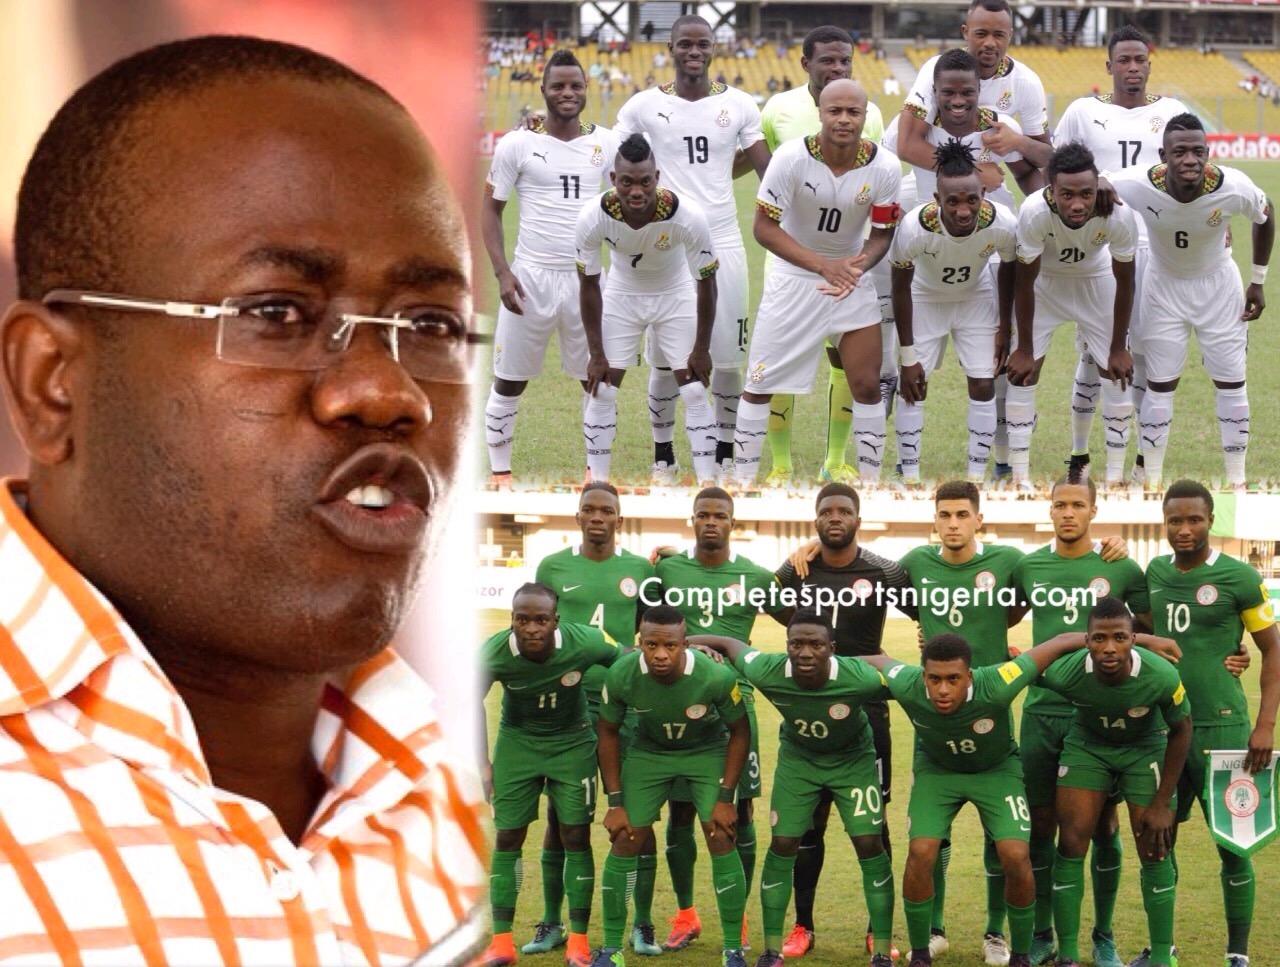 GFA Boss, Nyantaki: Nigeria, Ghana Rivalry Won't Stop; It's Good For Everyone